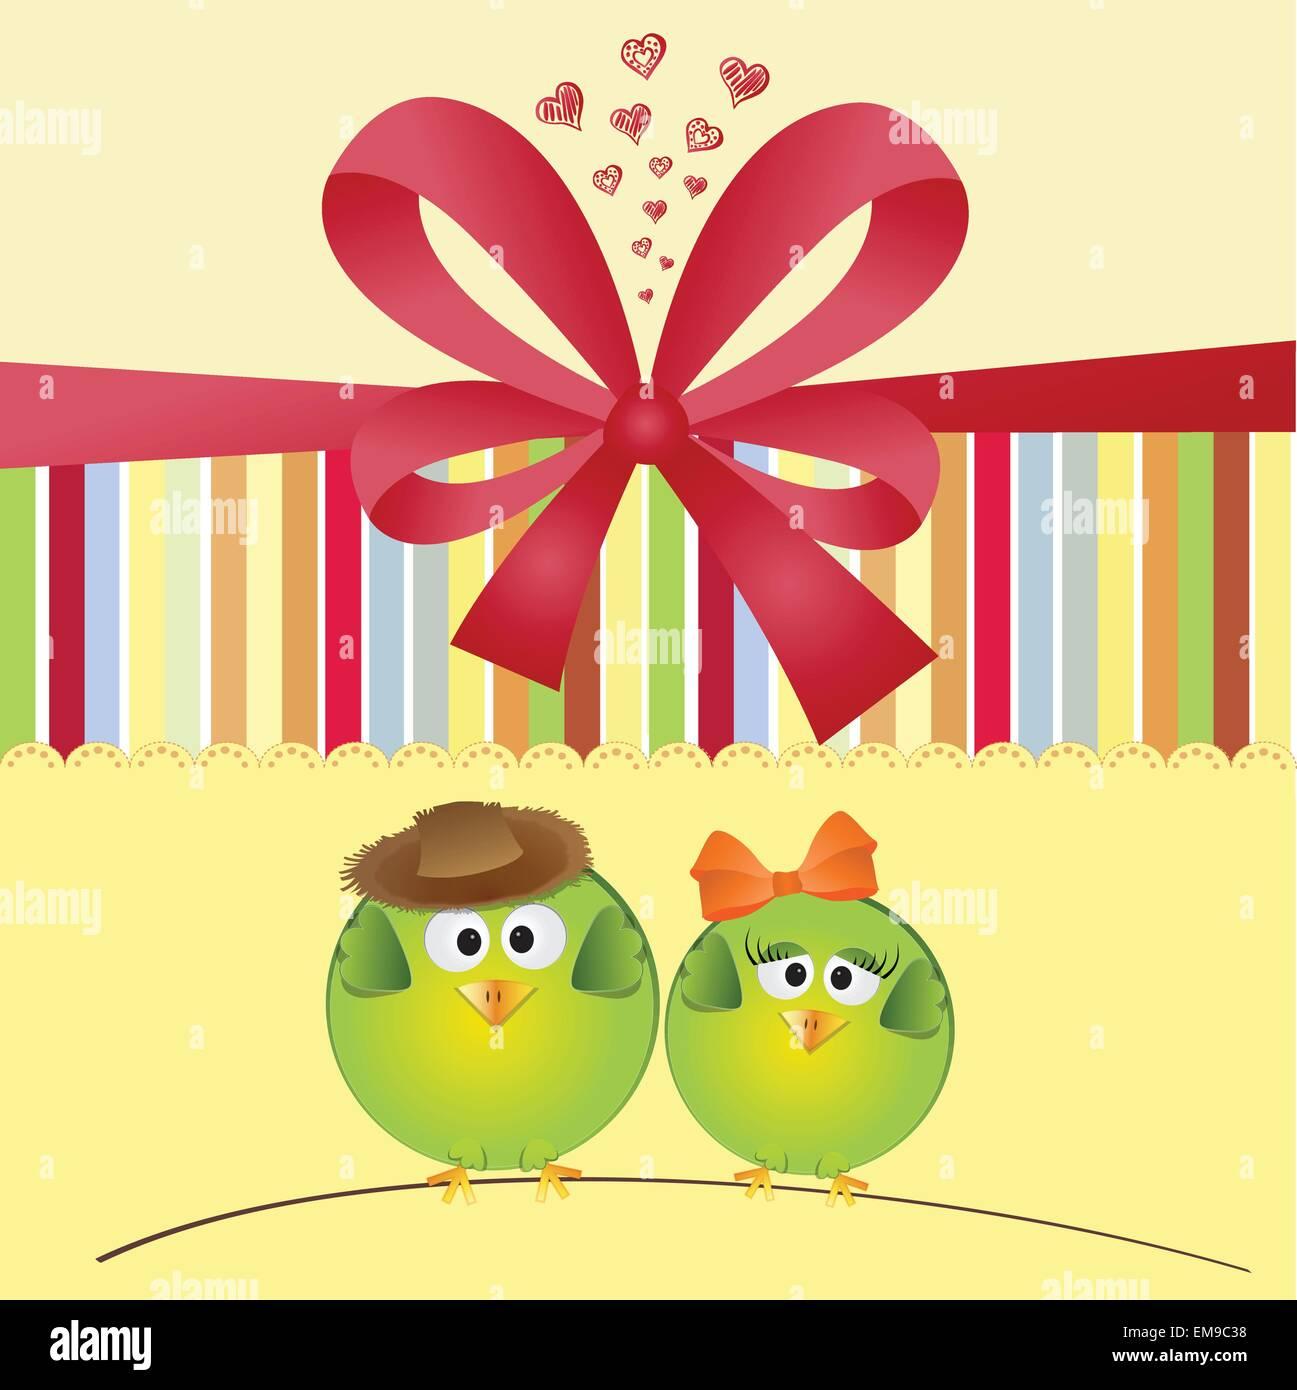 Wedding Invitation With Birds Stock Photos & Wedding Invitation With ...